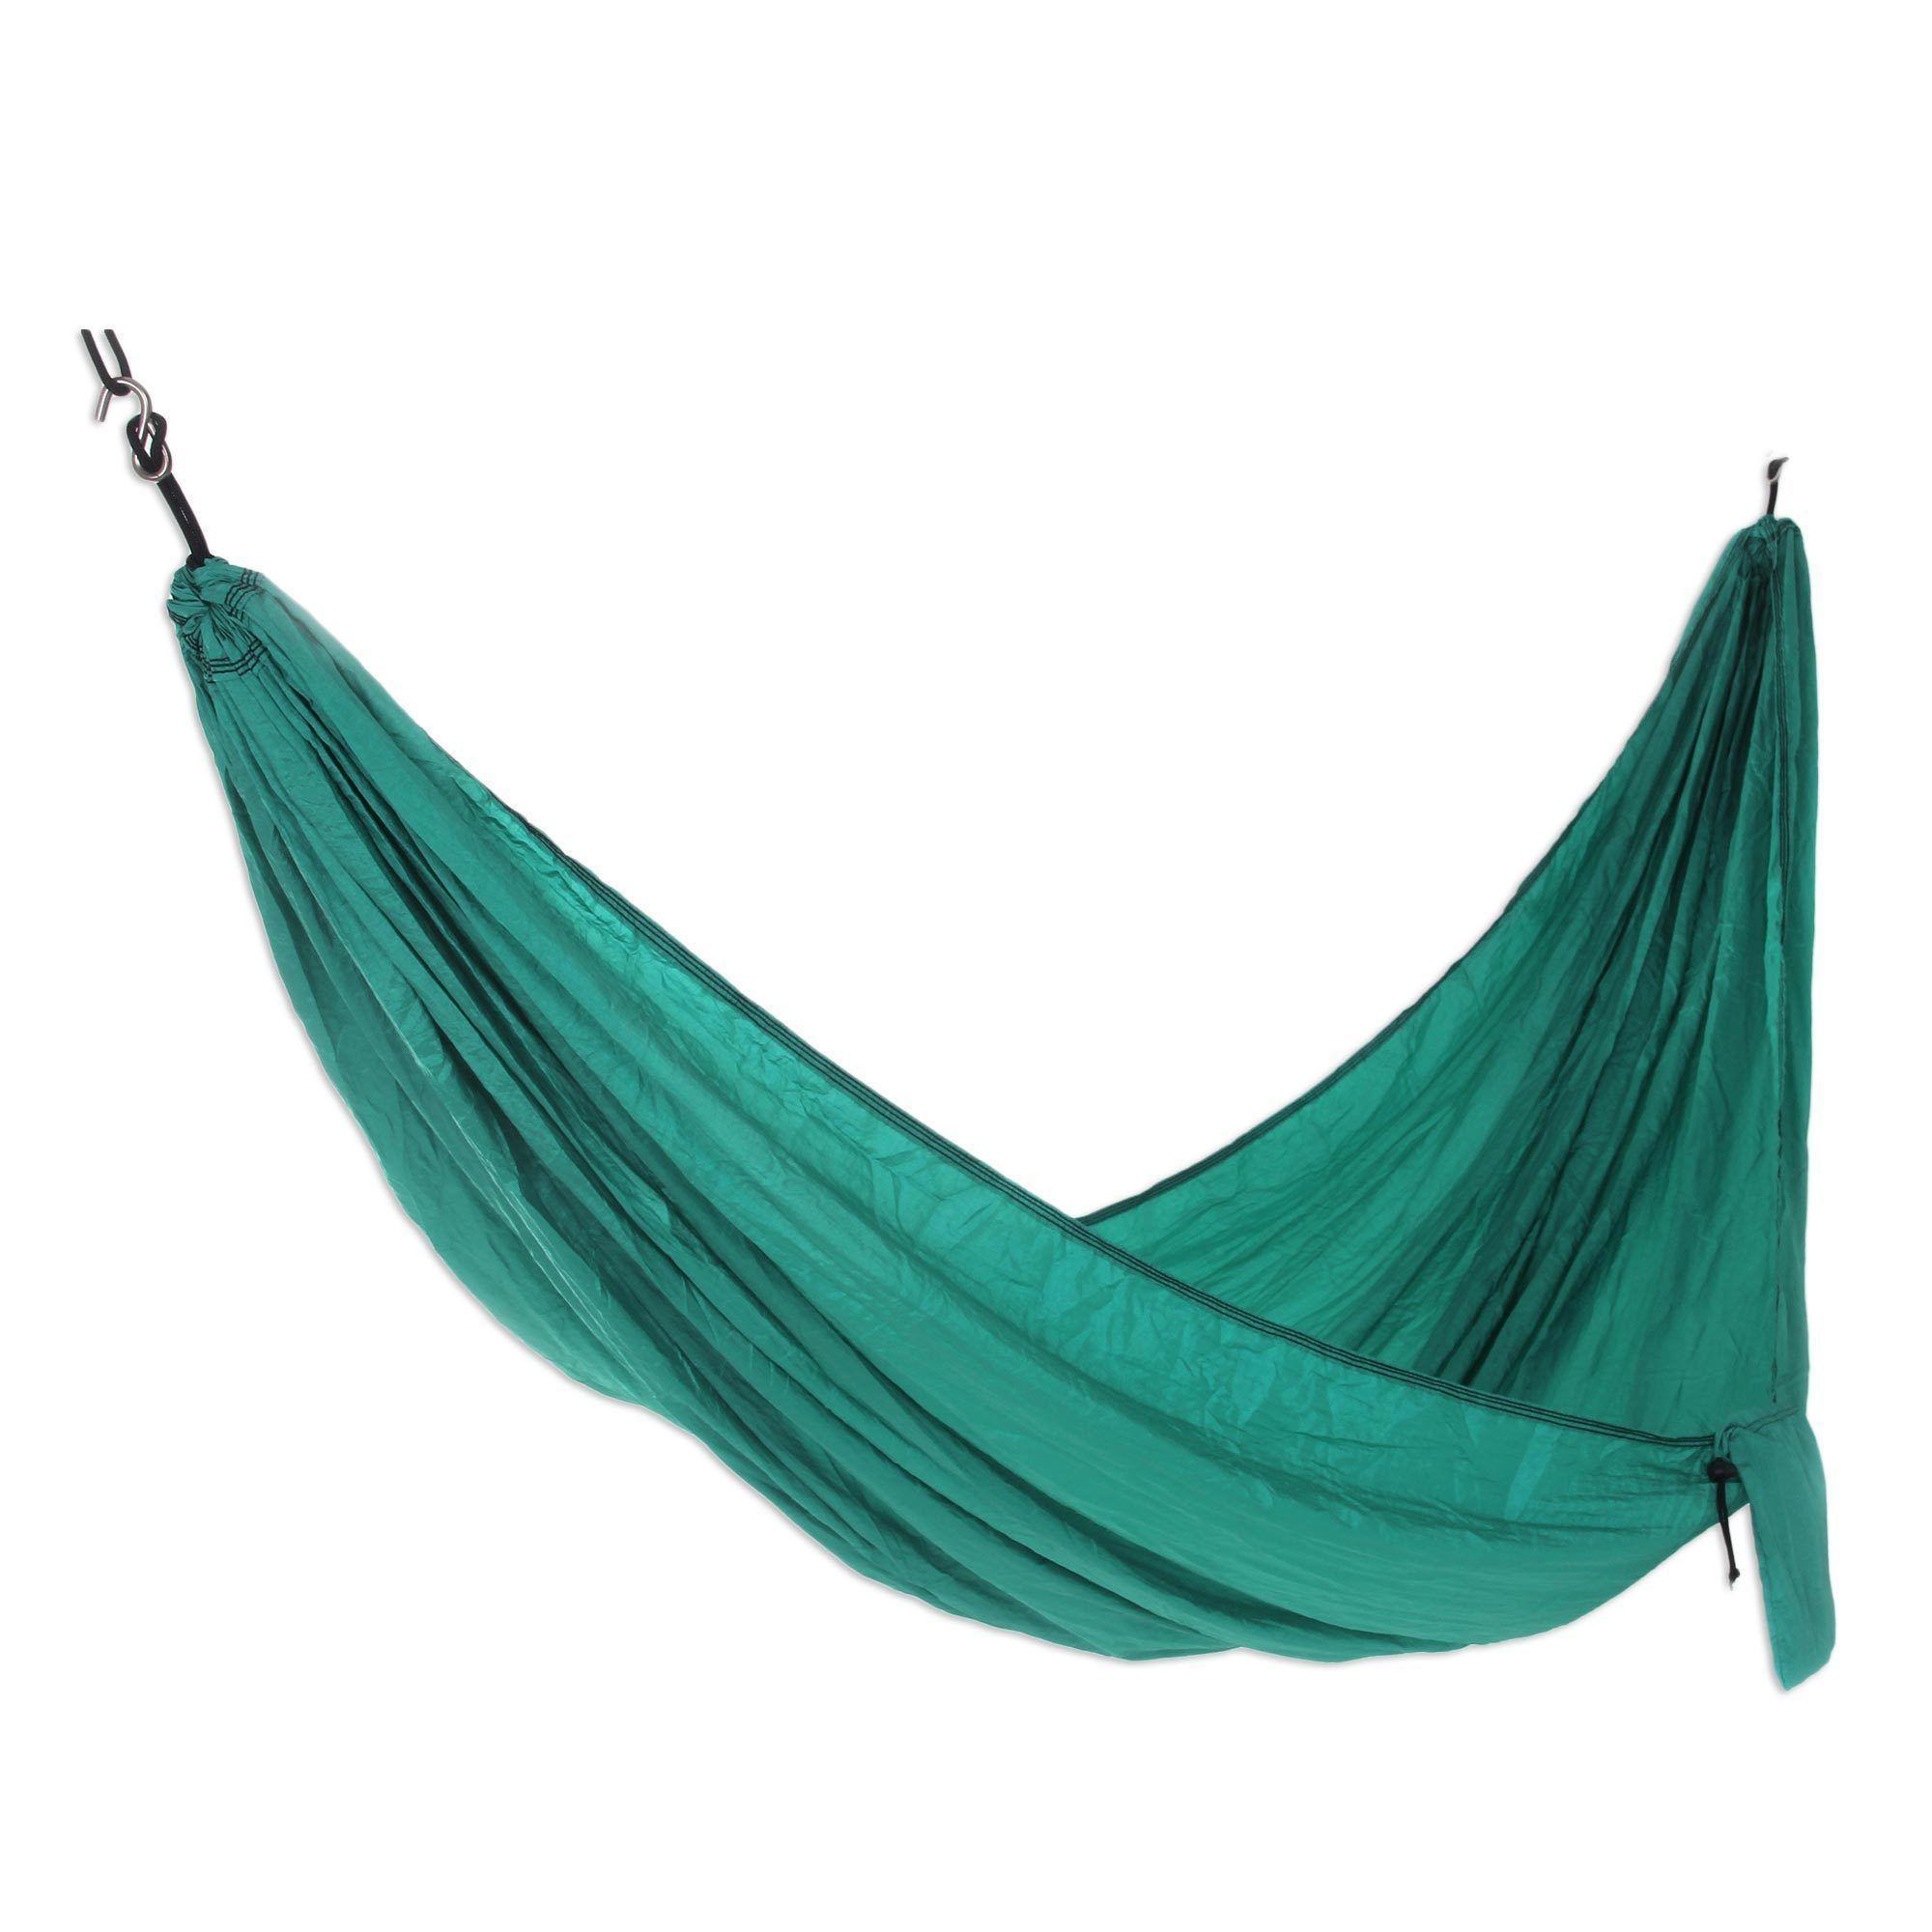 Novica single parachute hammock uuluwatu jadeu products